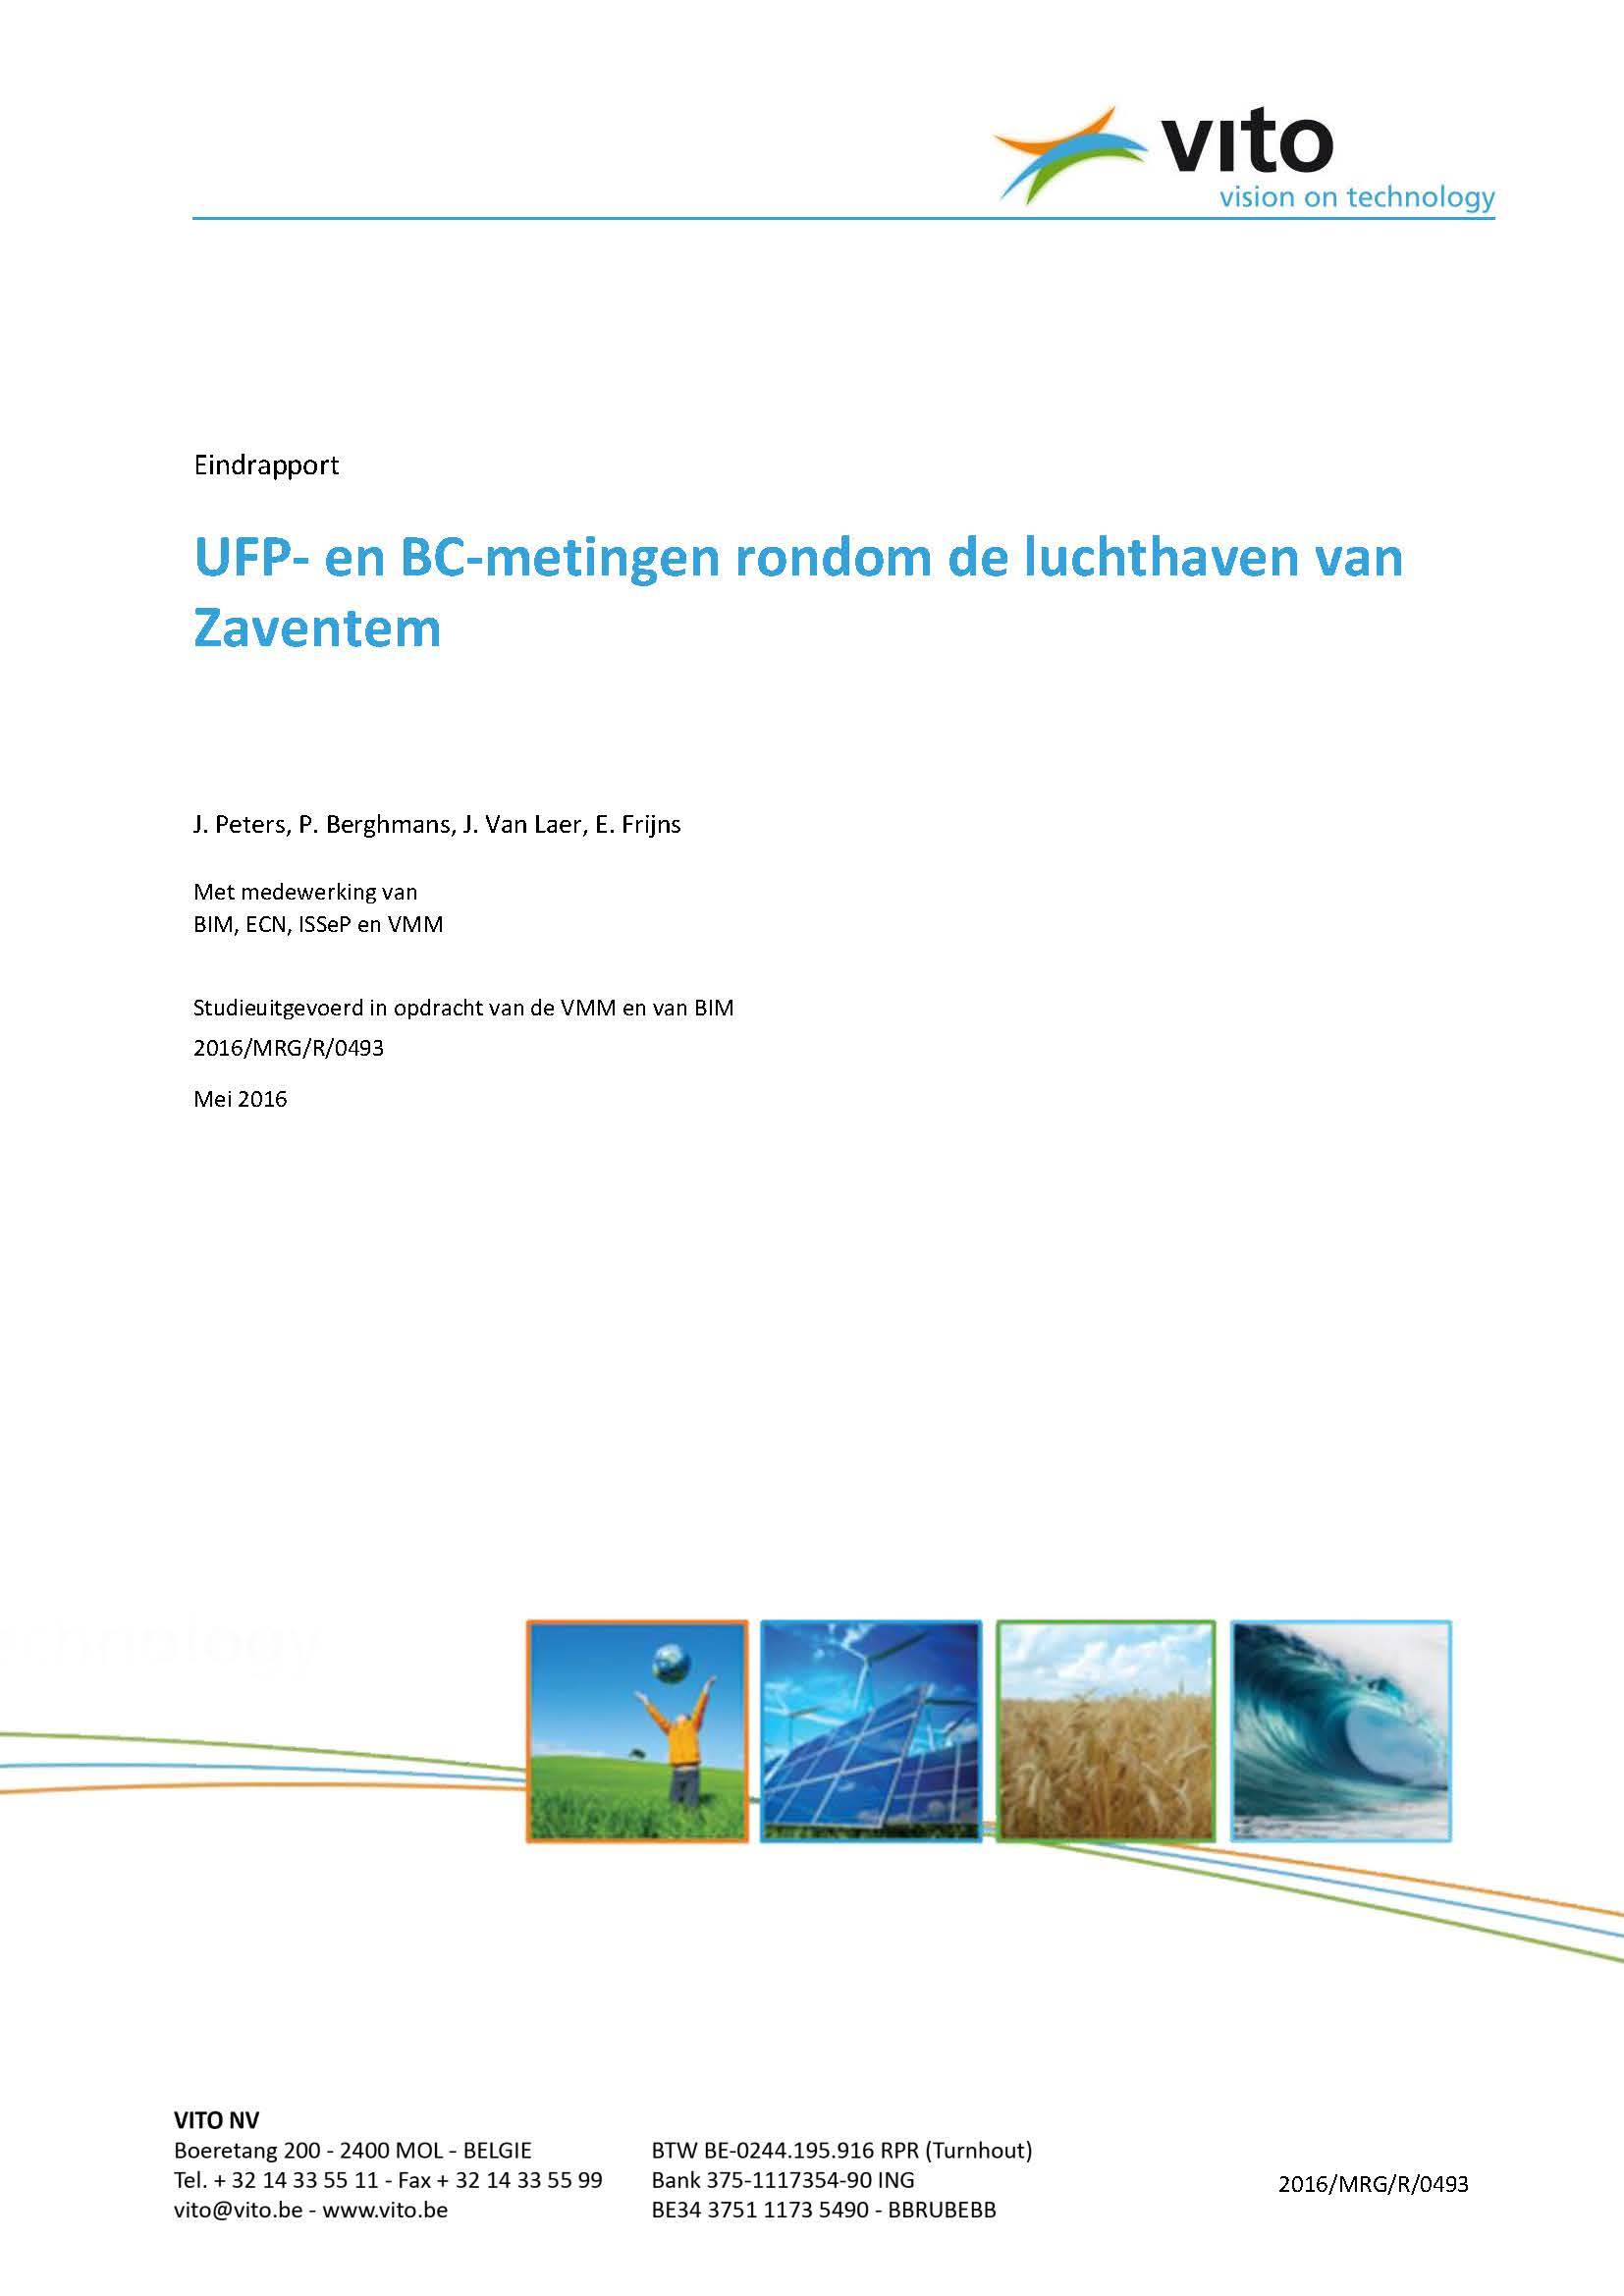 Rapport UFP- en BC-metingen luchthaven Zaventem